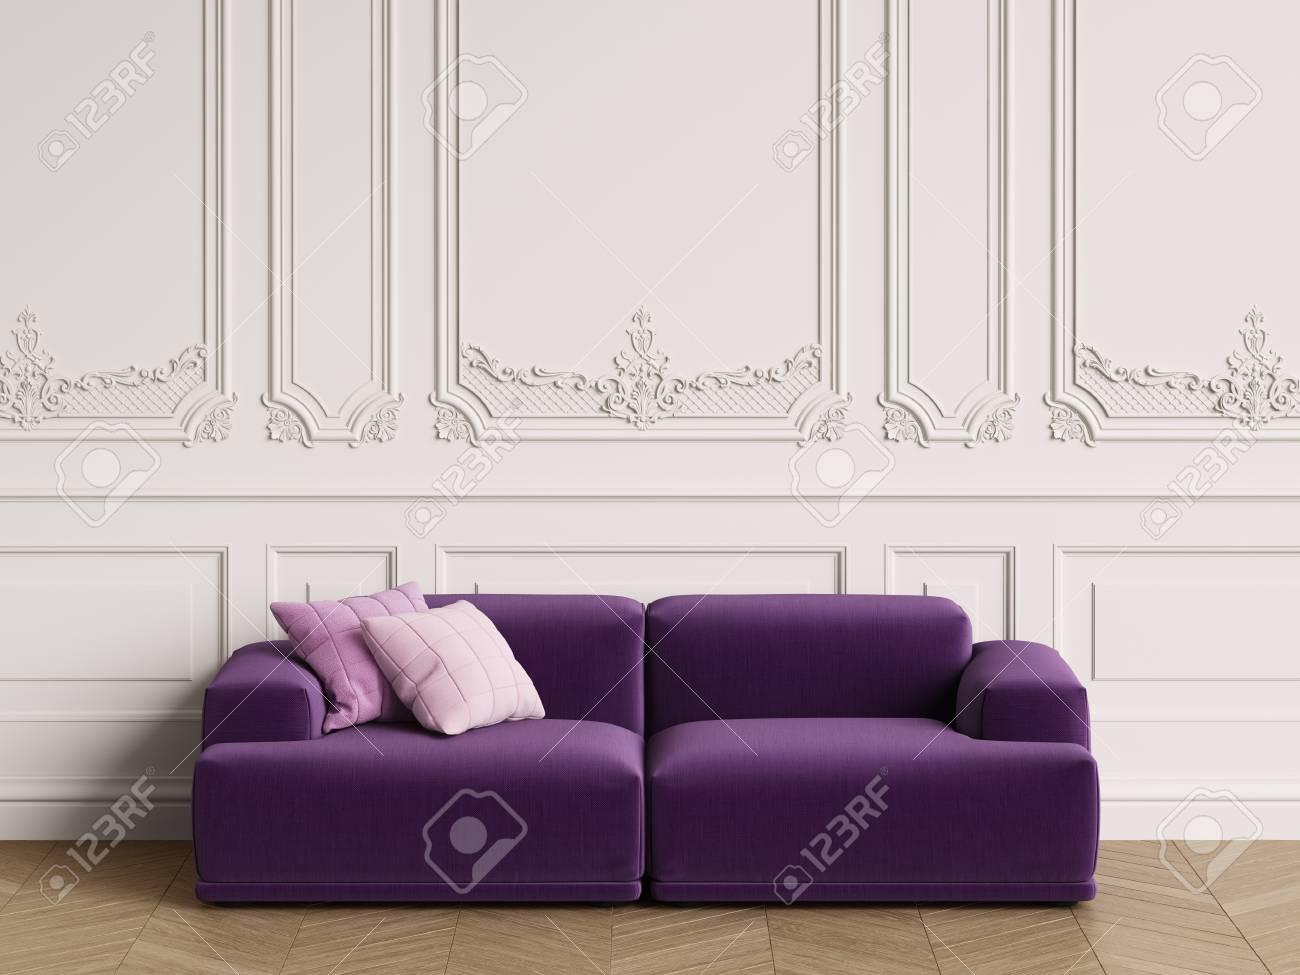 Modern Scandinavian Design Sofa In Classic Interior. Walls With ...